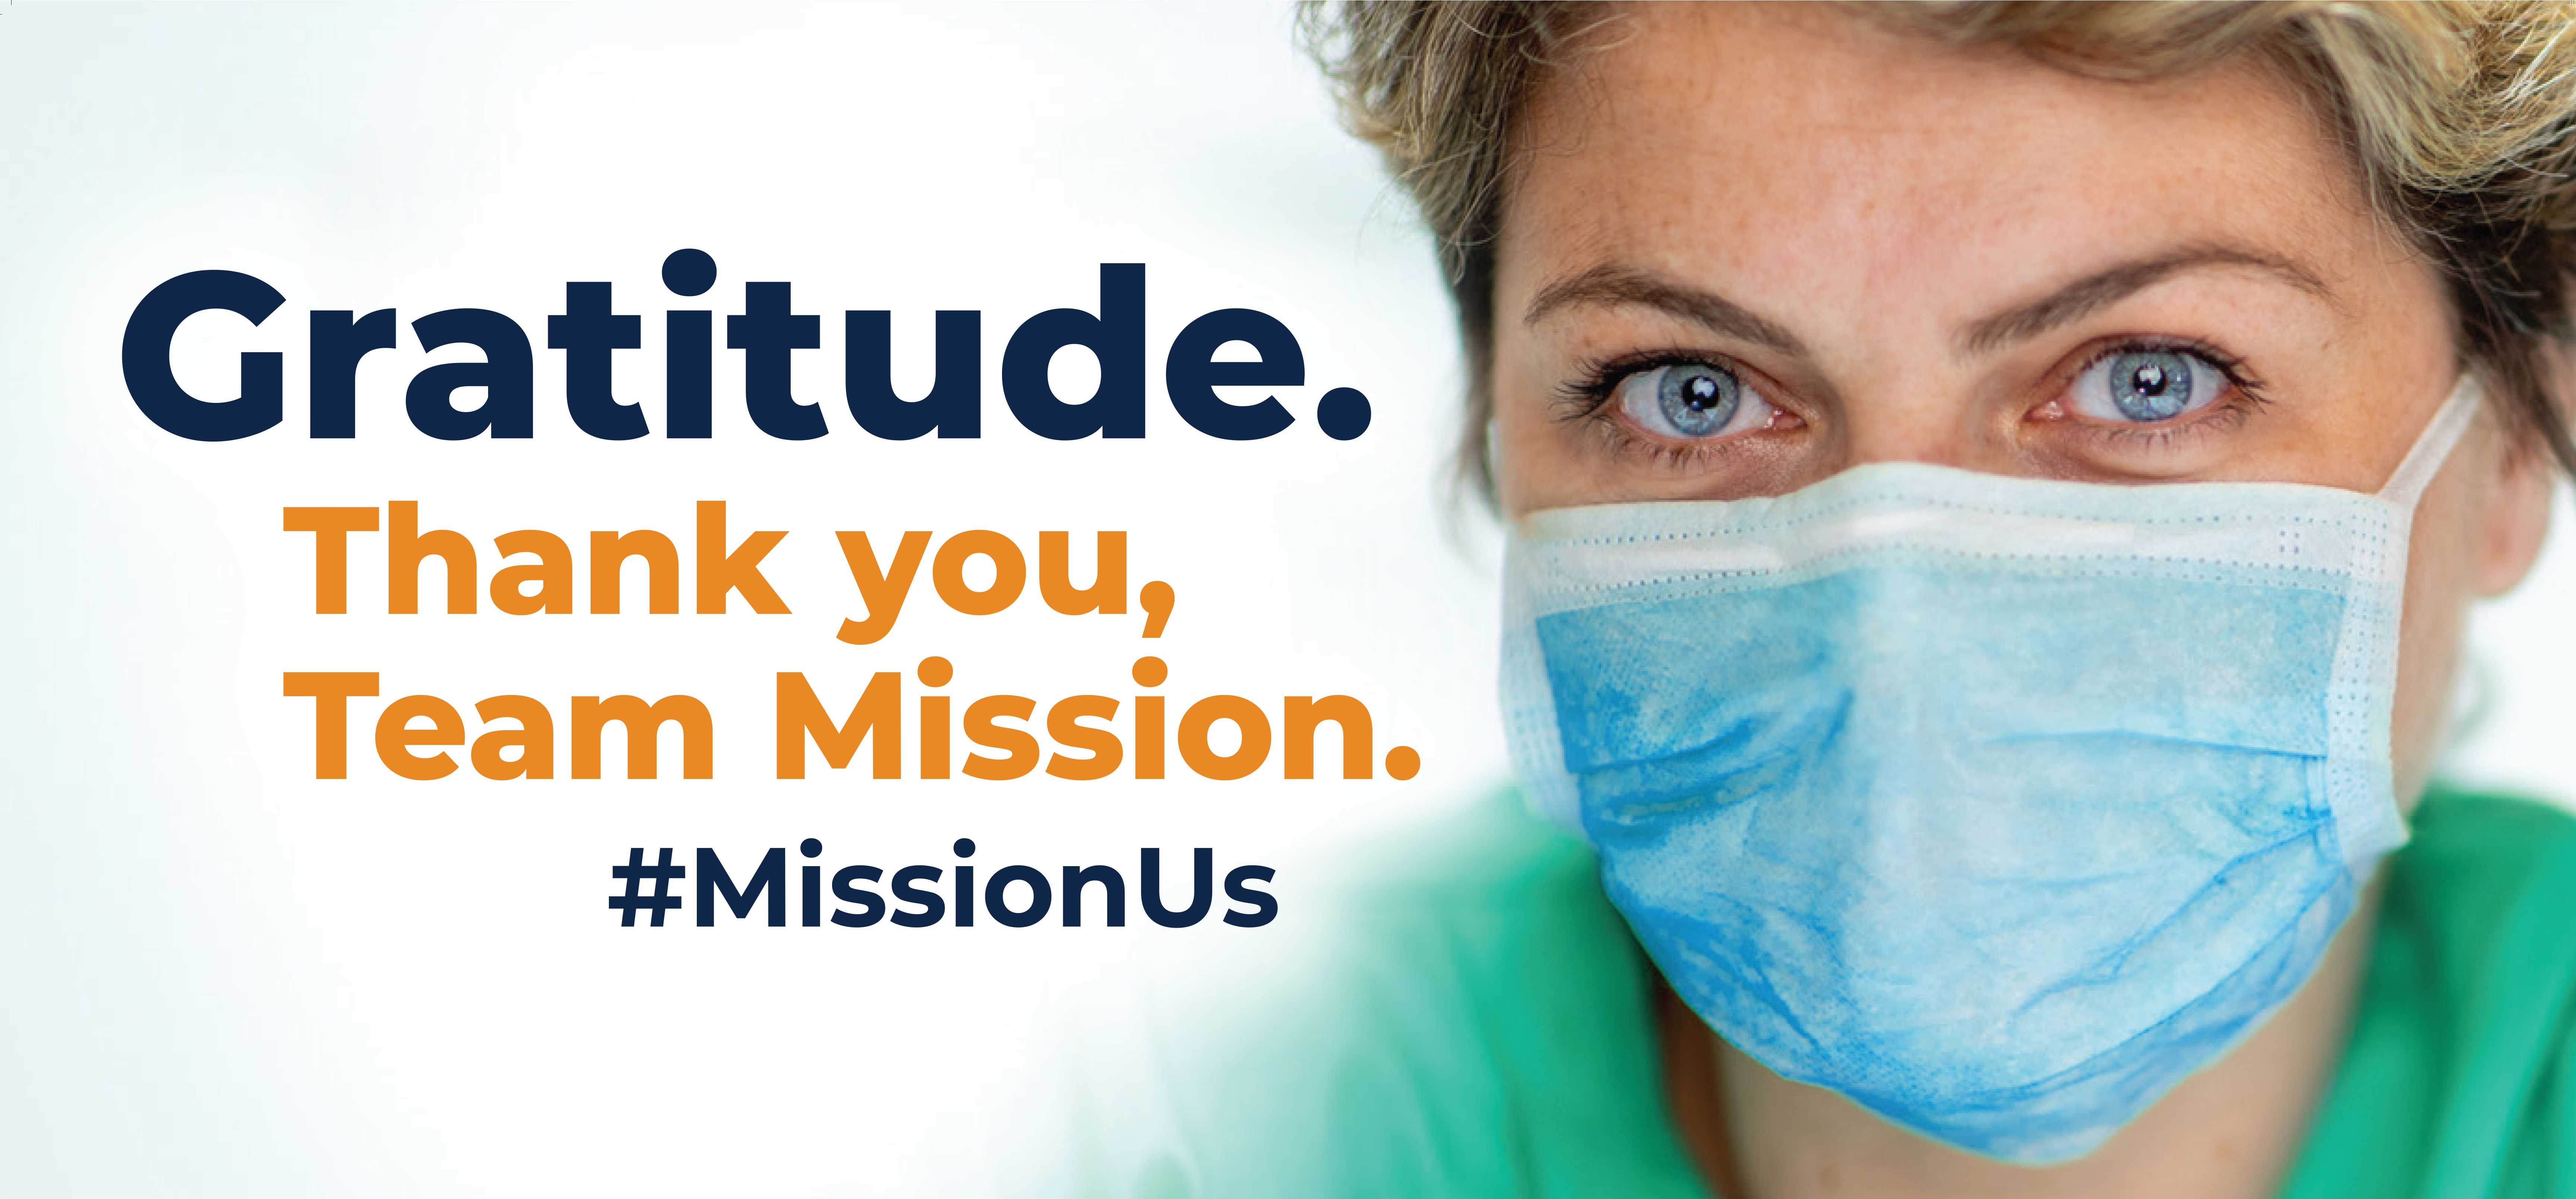 Gratitude for Nurses